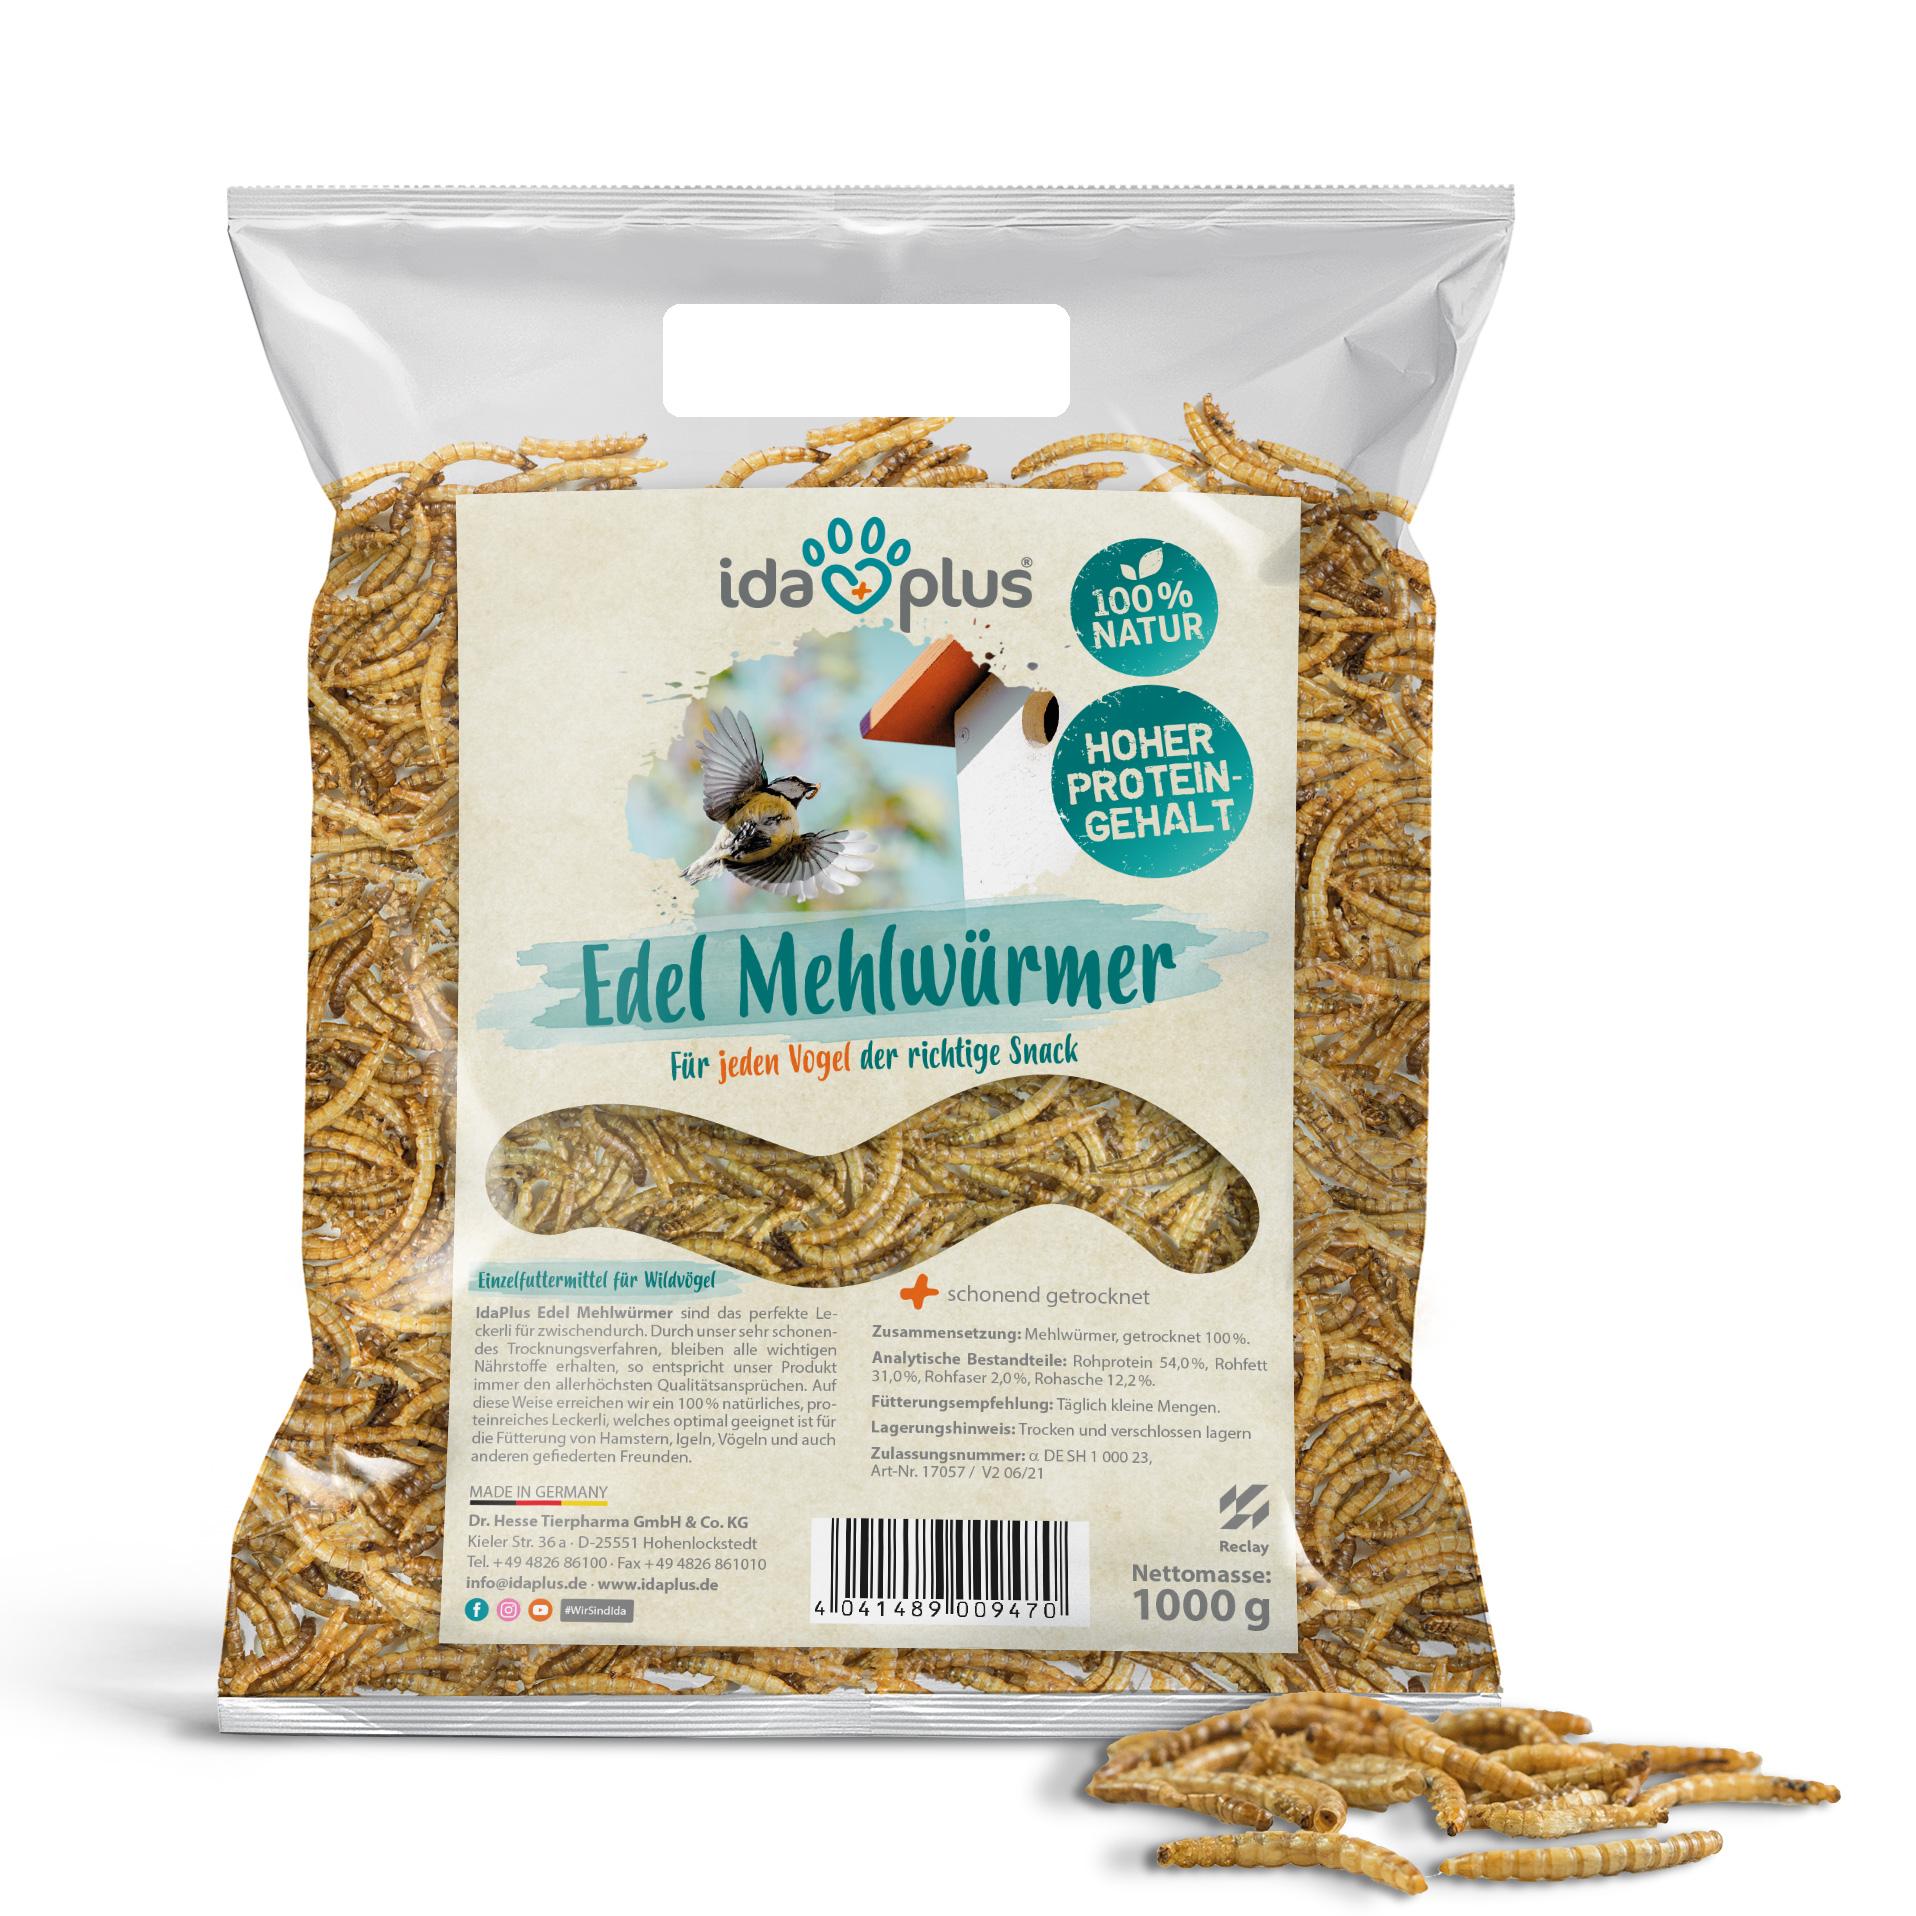 Edel Mehlwürmer getrocknet - Insekten Snack für Wildvögel - 1000g